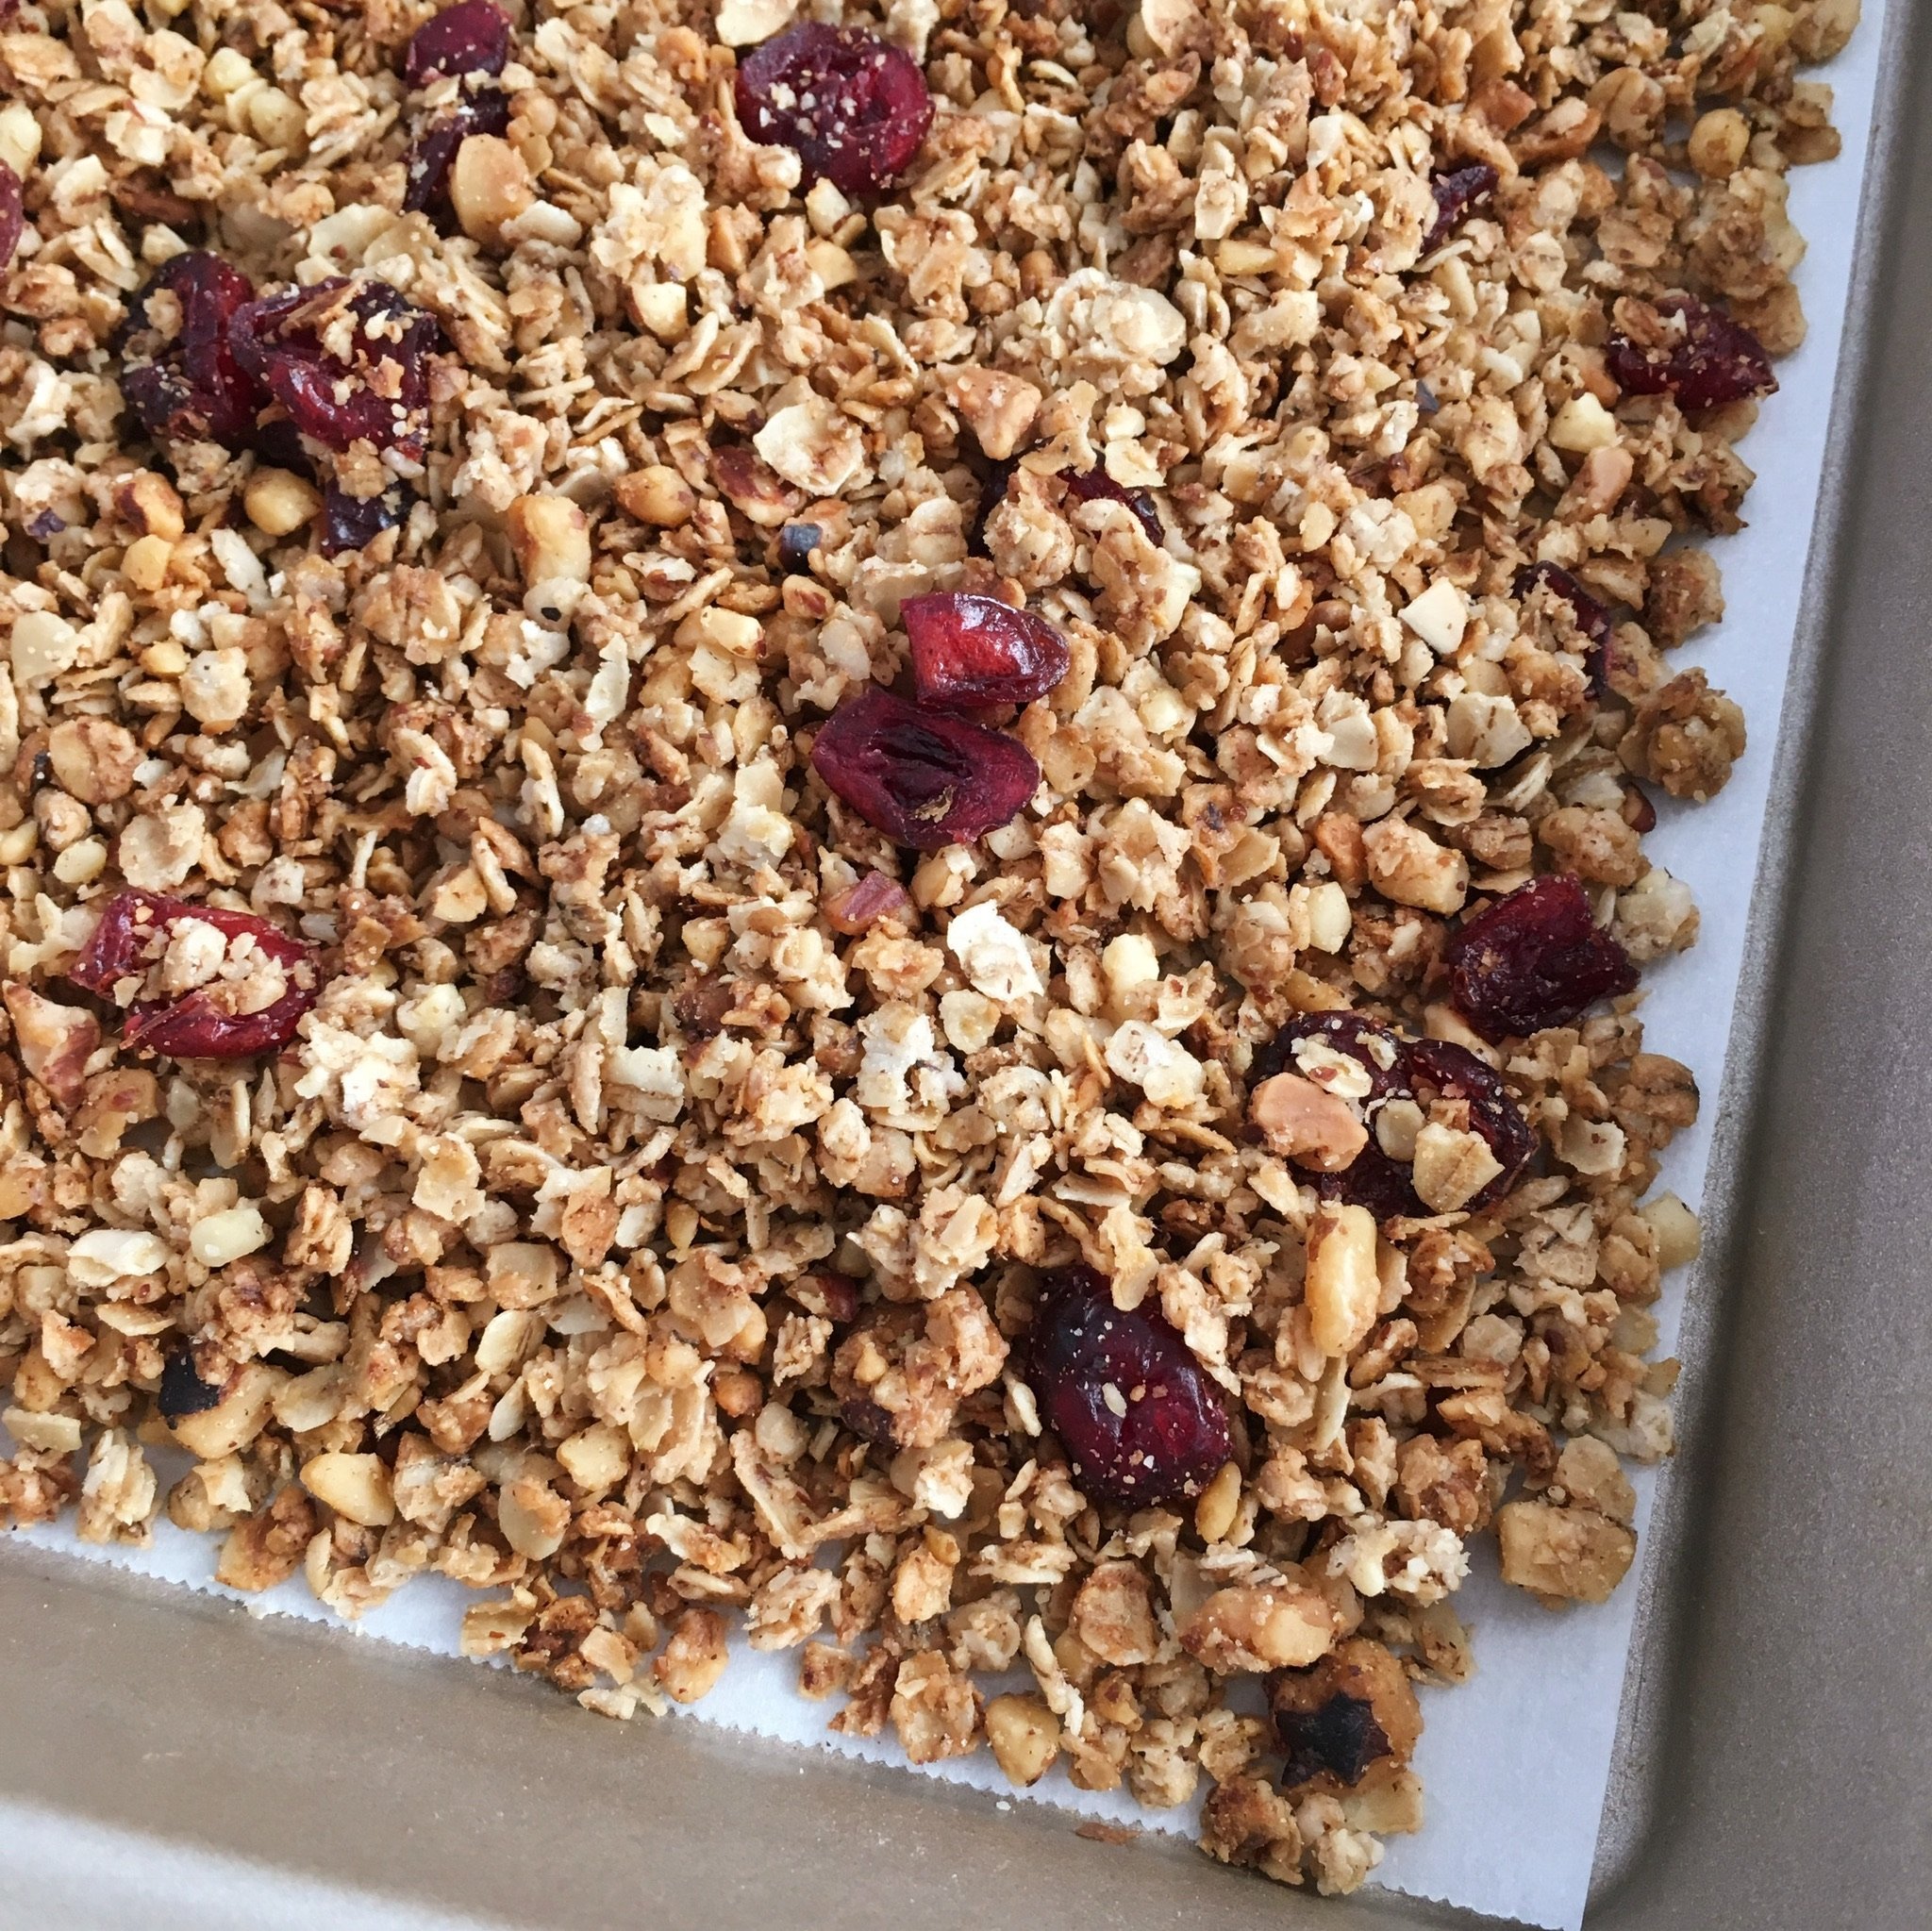 easy homemade granola gluten free #glutenfreerecipes www.healthygffamily.com